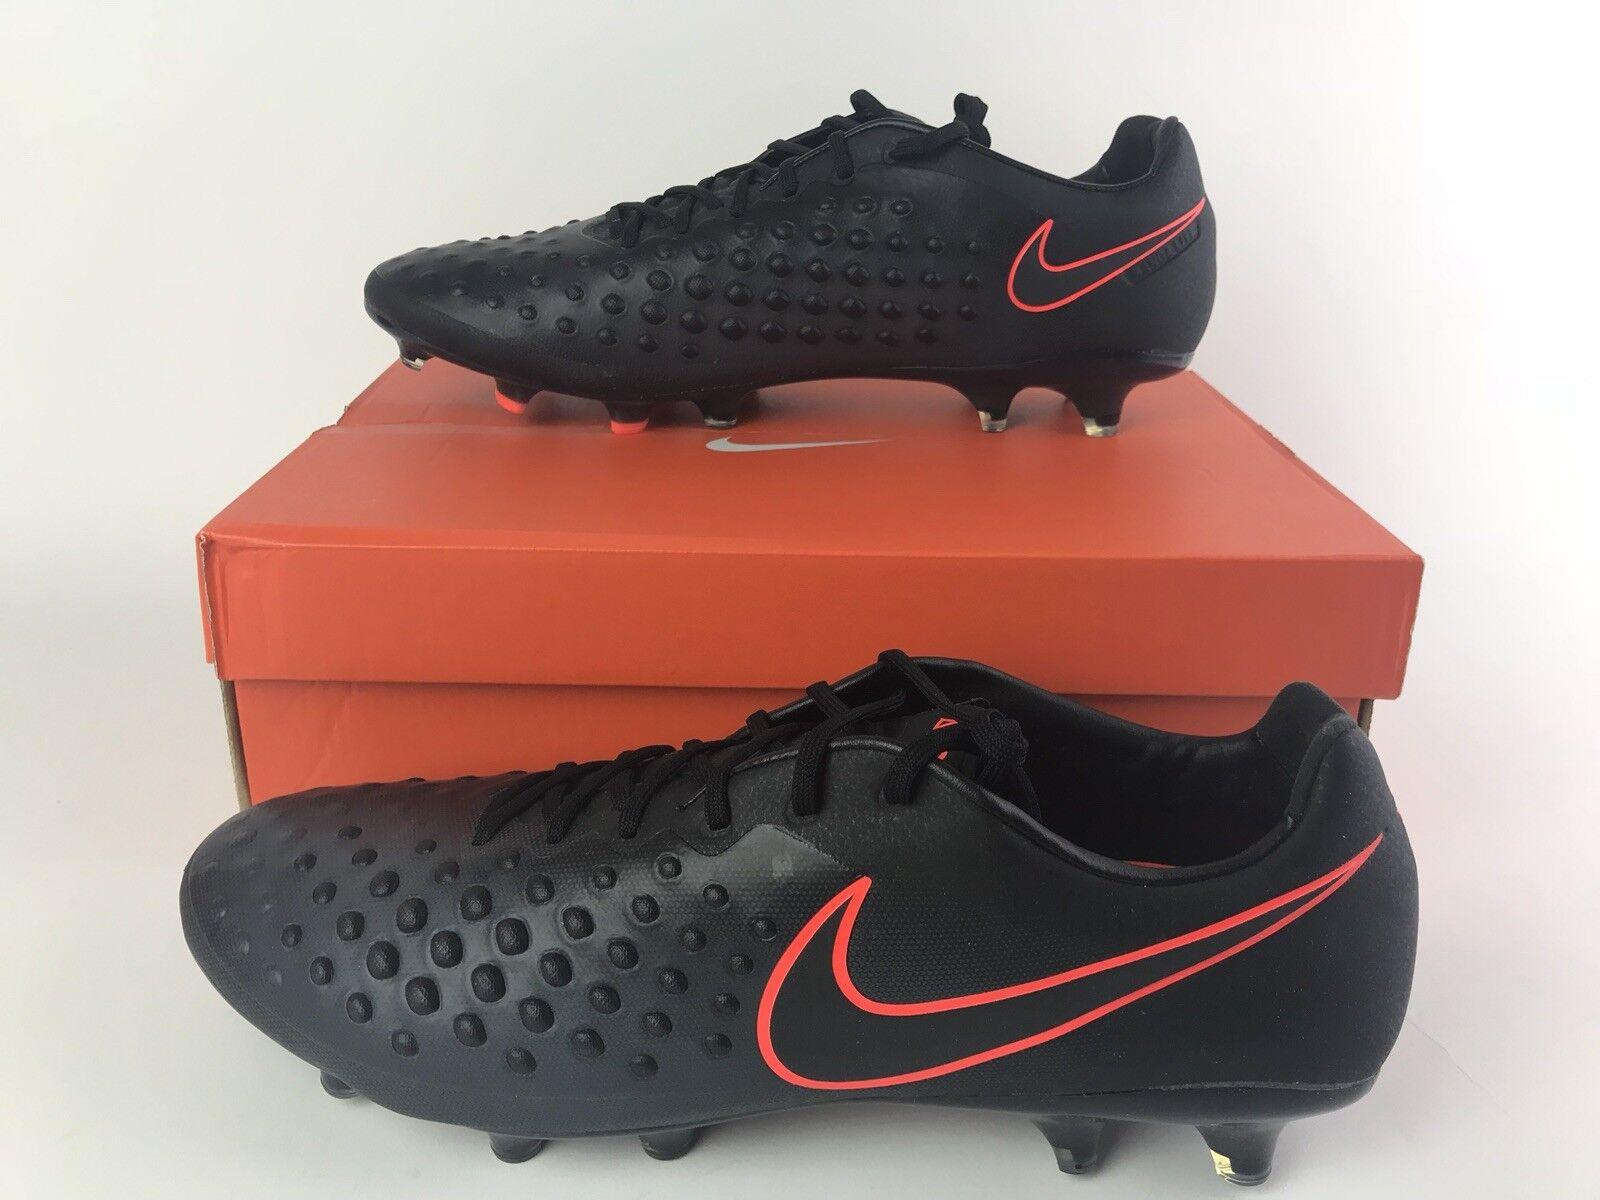 Nike Magista Opus II FG Soccer Cleats Black Orange 843813-008 Size 9 E5 403